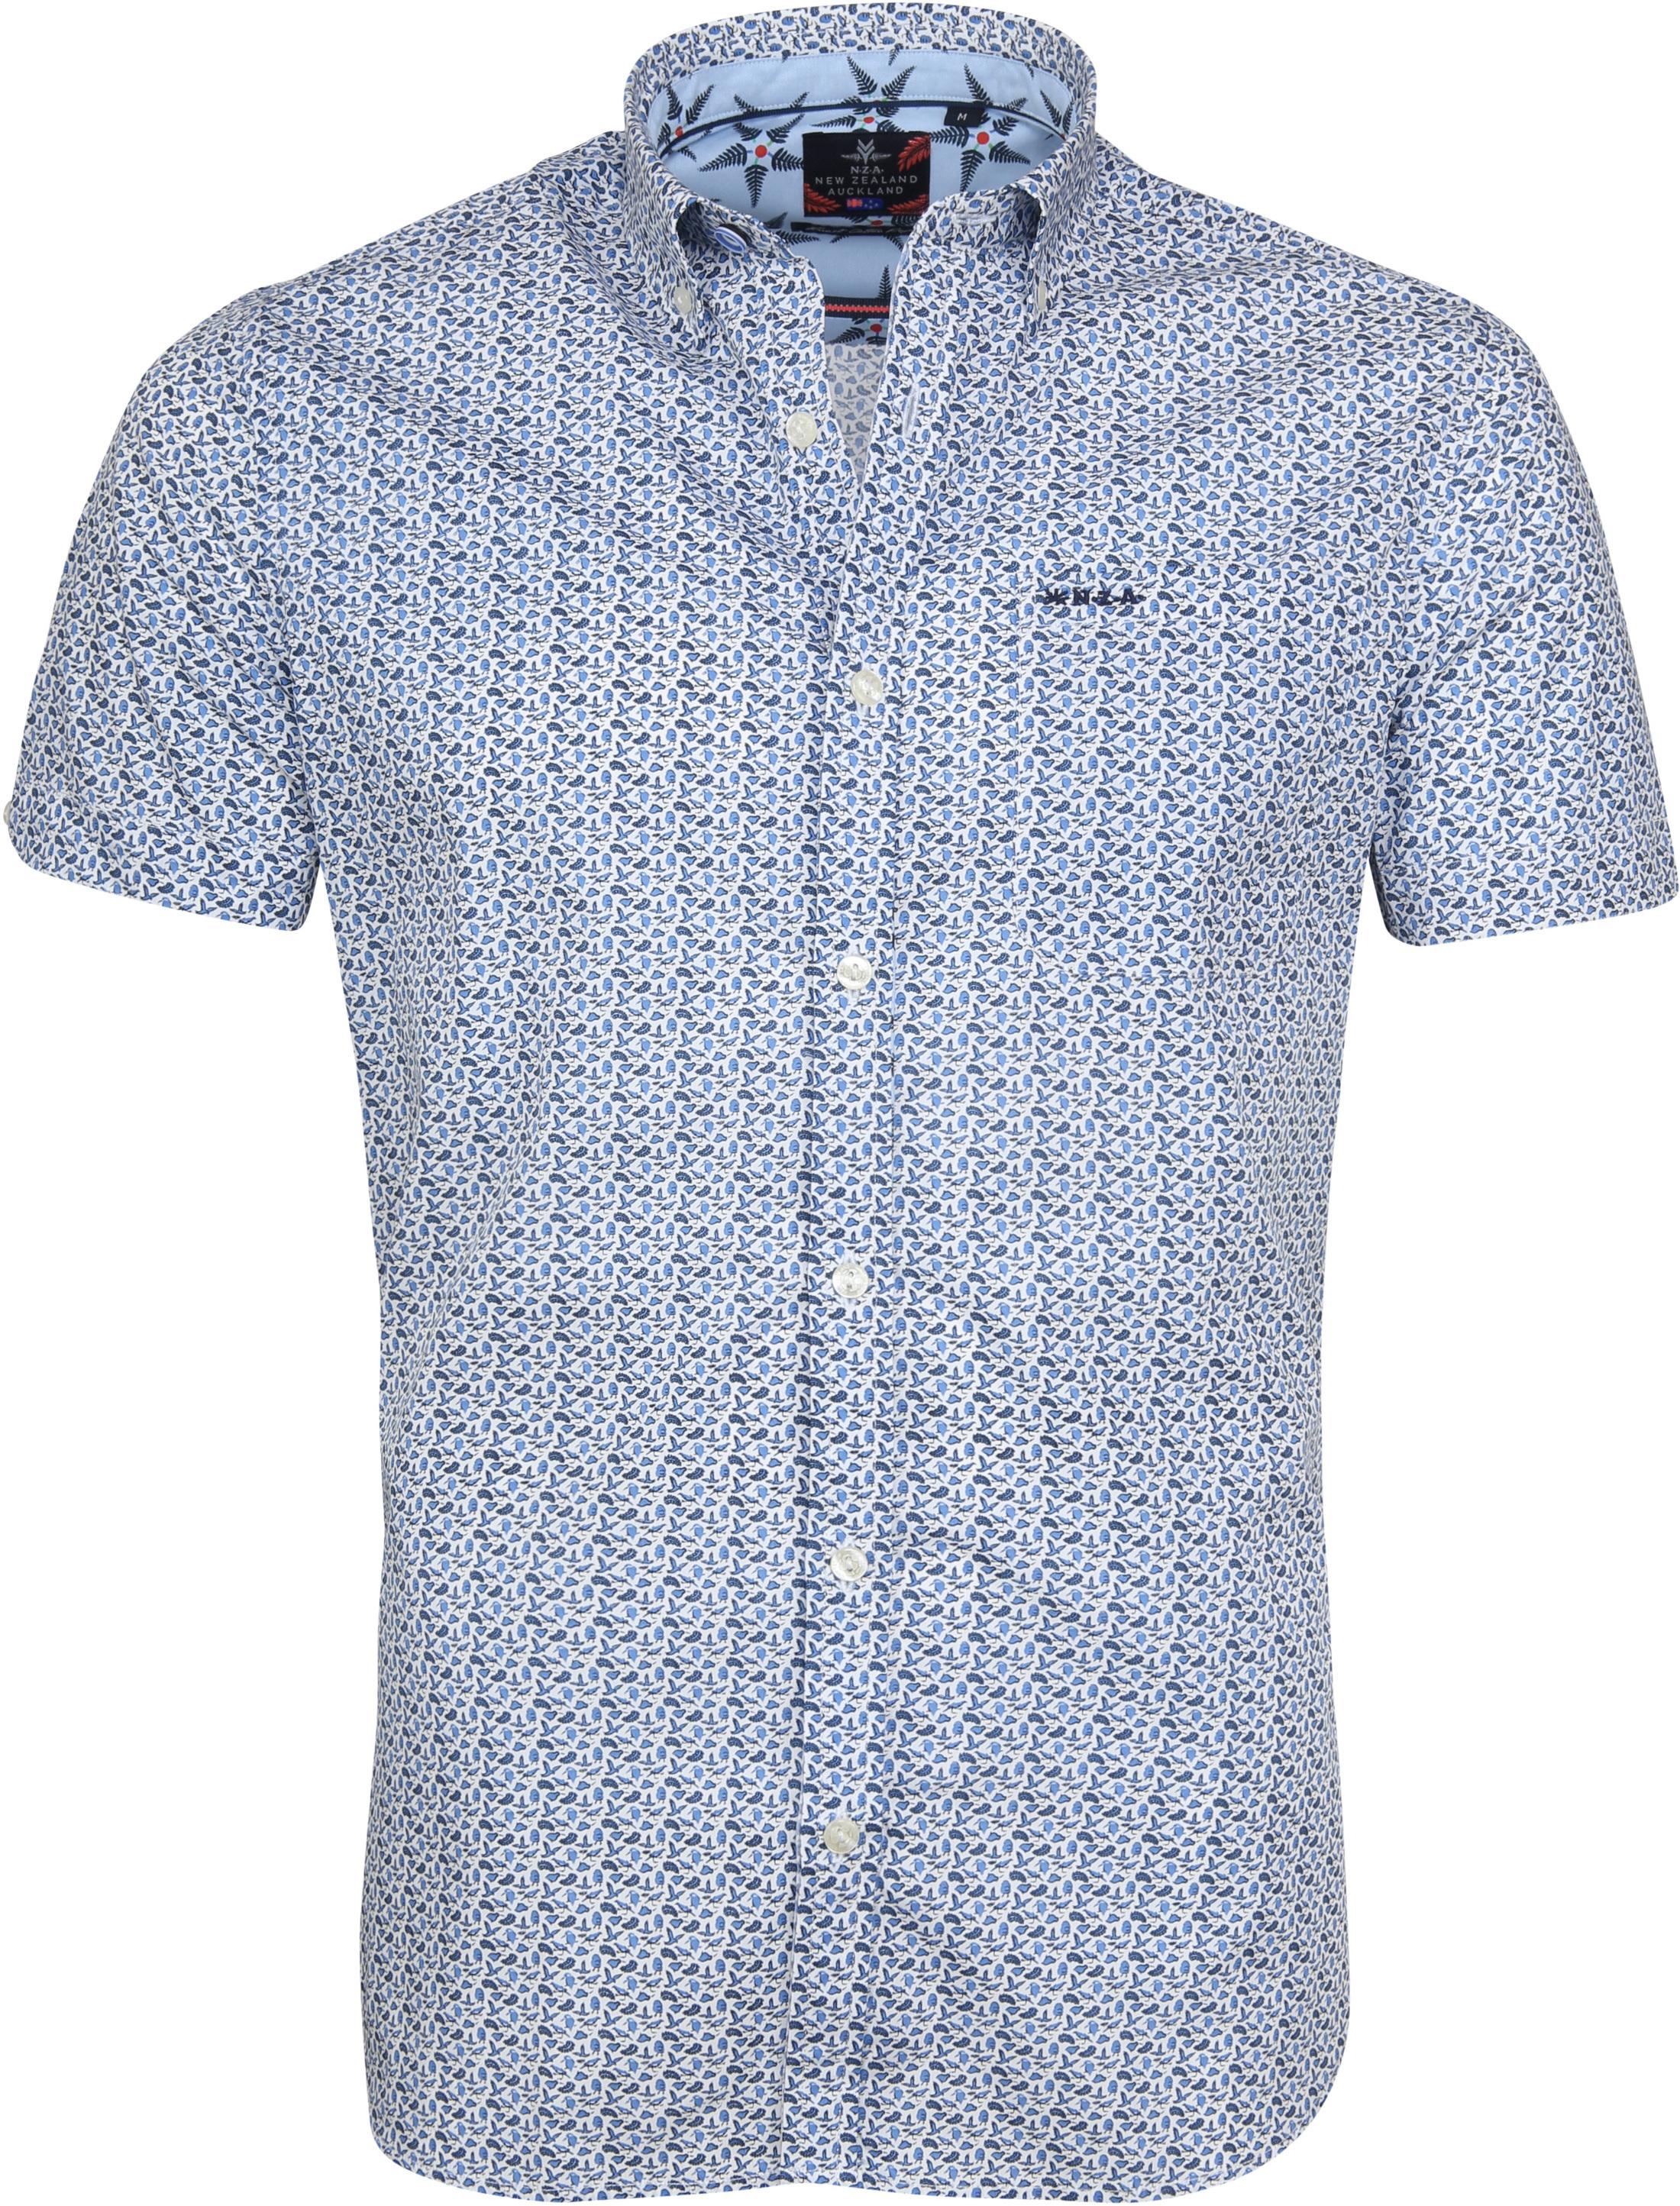 NZA Overhemd Shortsleeve Paparoa foto 0